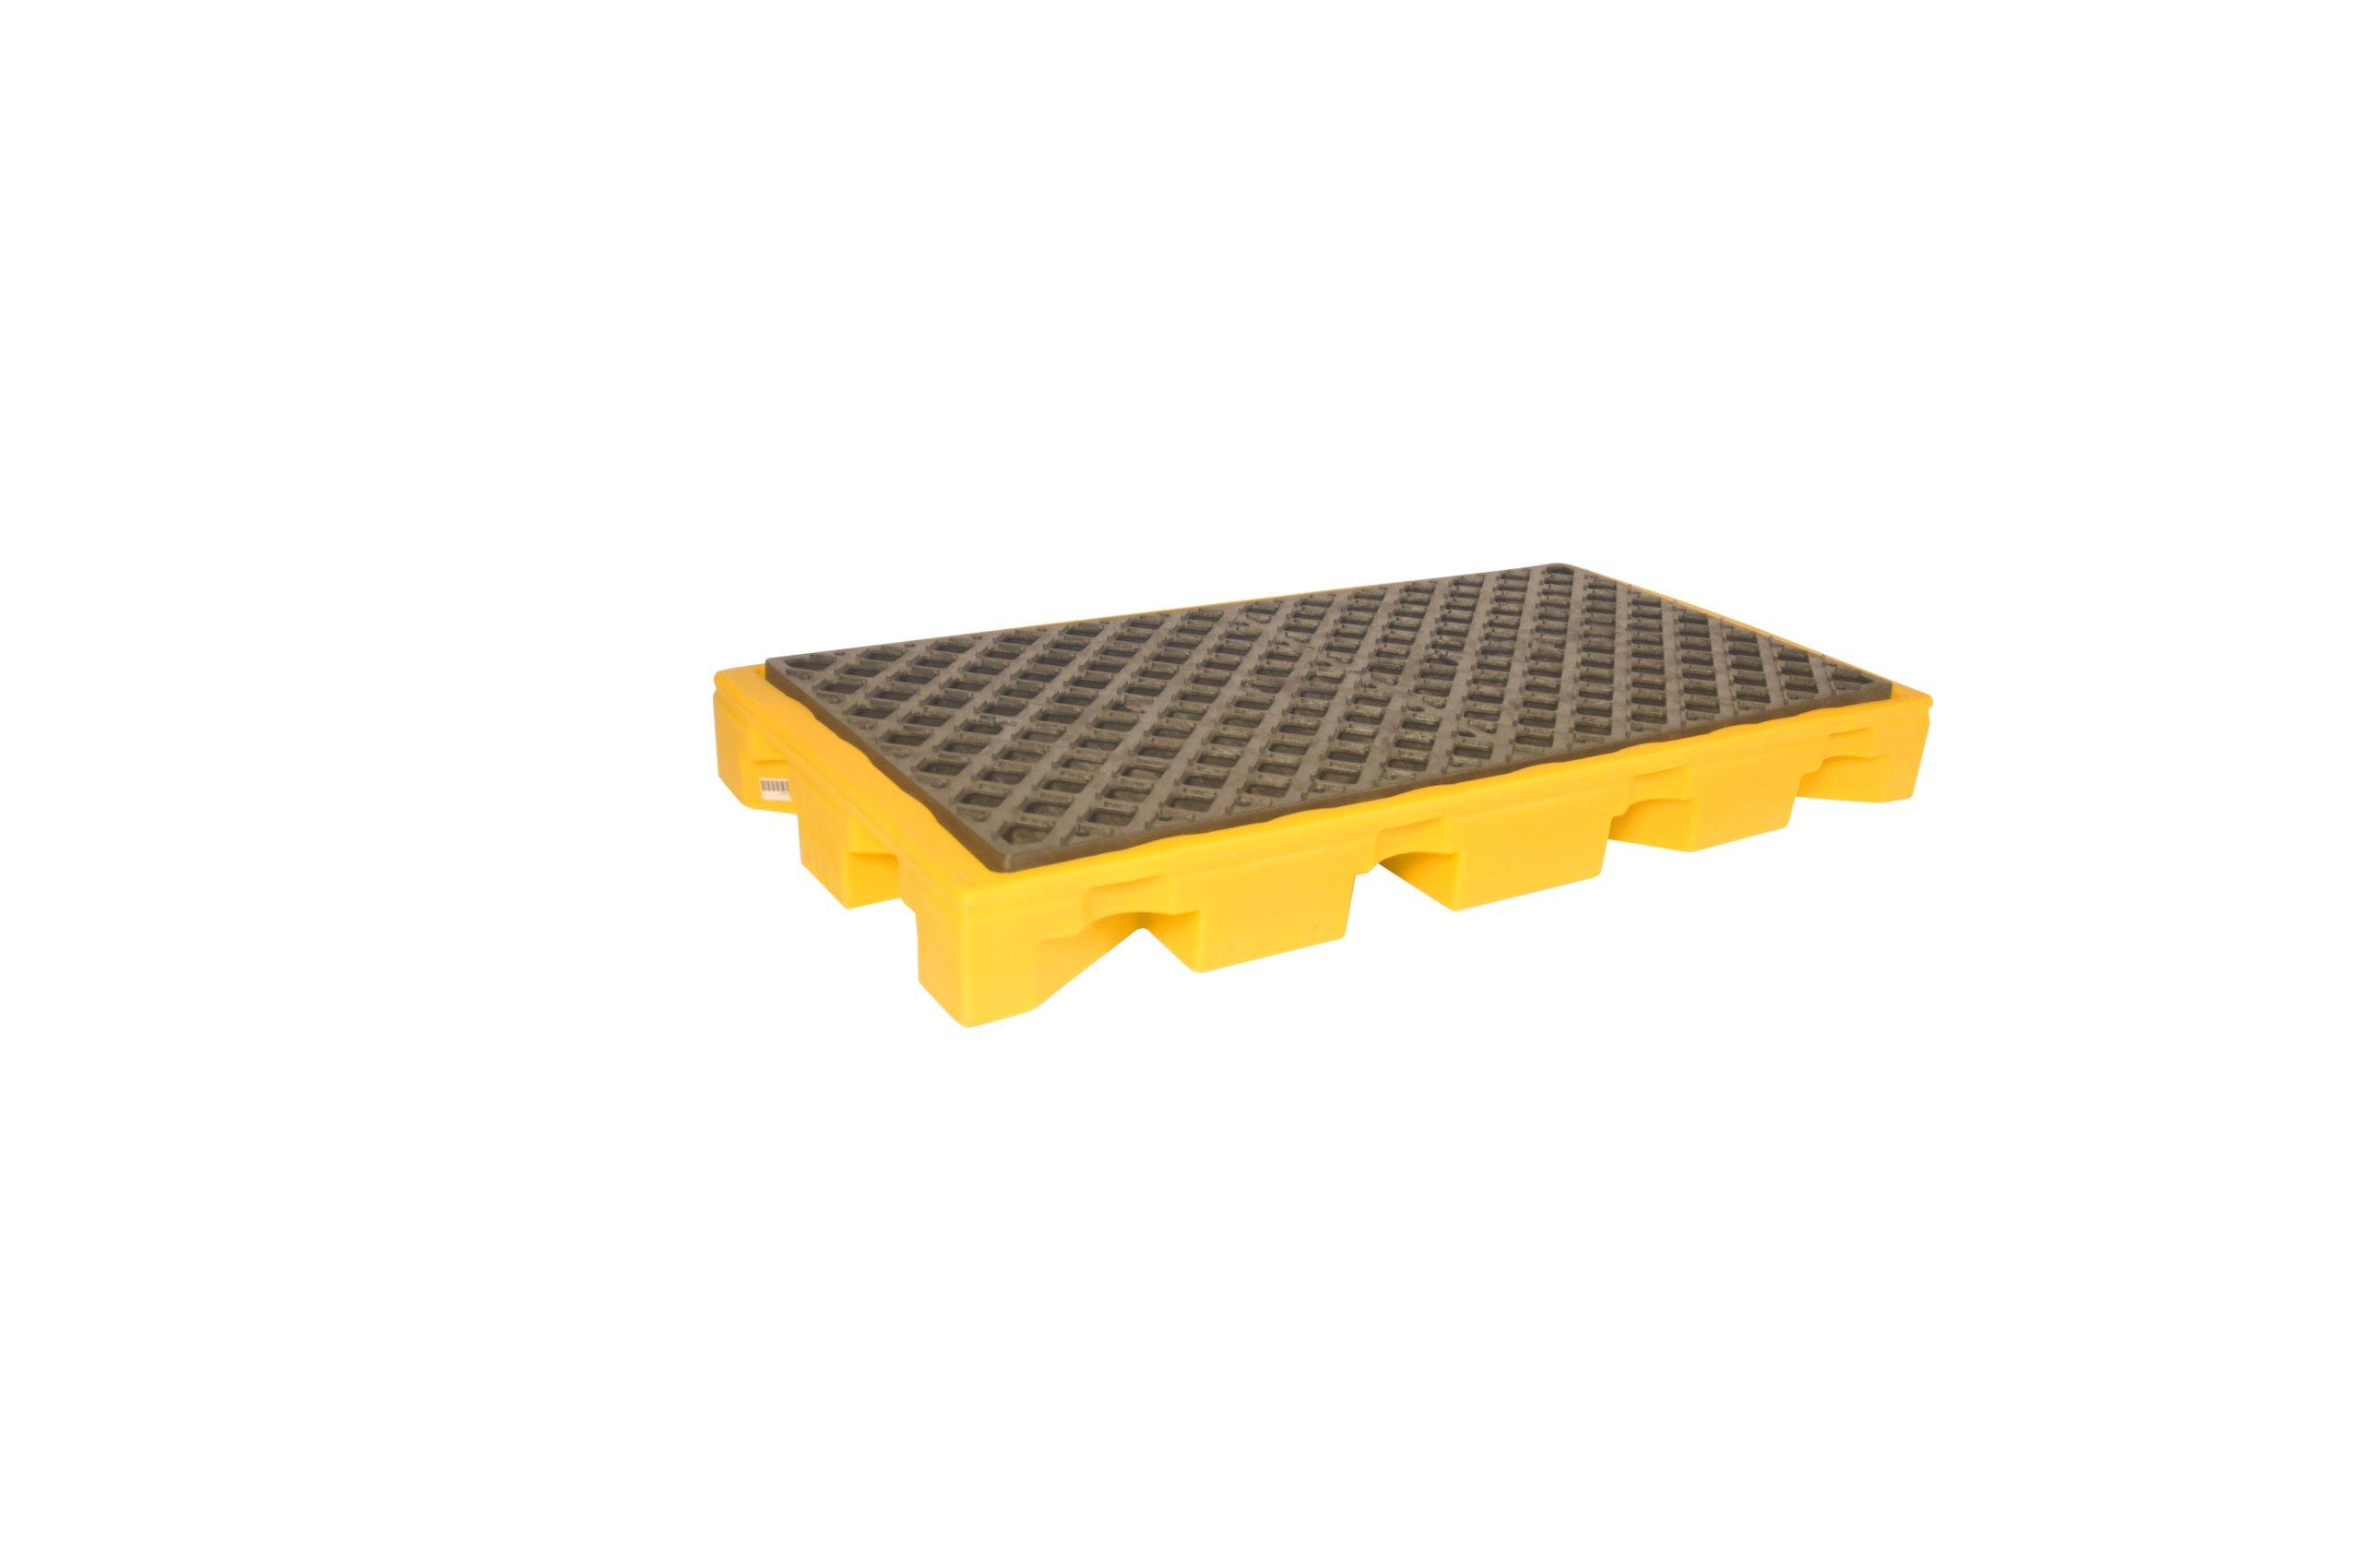 UltraTech 1086 Polyethylene P2 2-Drum Ultra-Spill Deck, 3000 lbs Capacity, 5 Year Warranty, Yellow